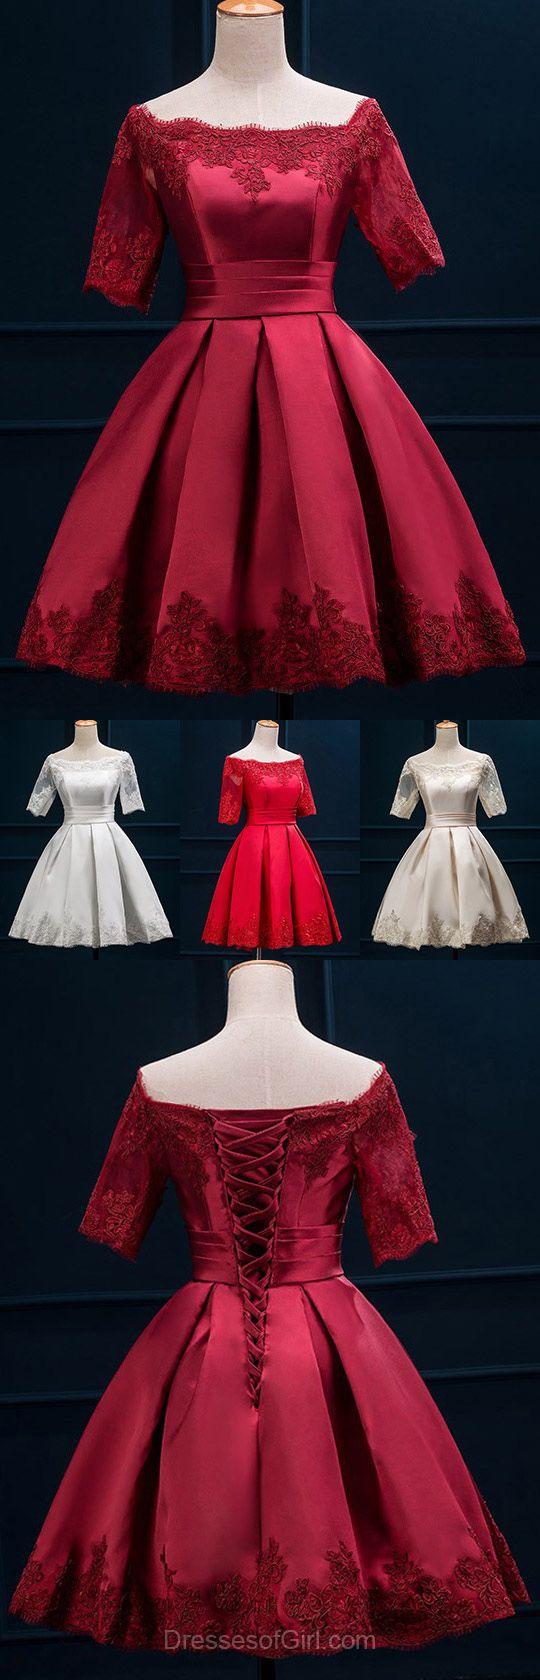 Short Prom Dress, Burgundy Prom Dresses, Cheap Homecoming Dress, Princess Homecoming Dresses, Aline Cocktail Dresses